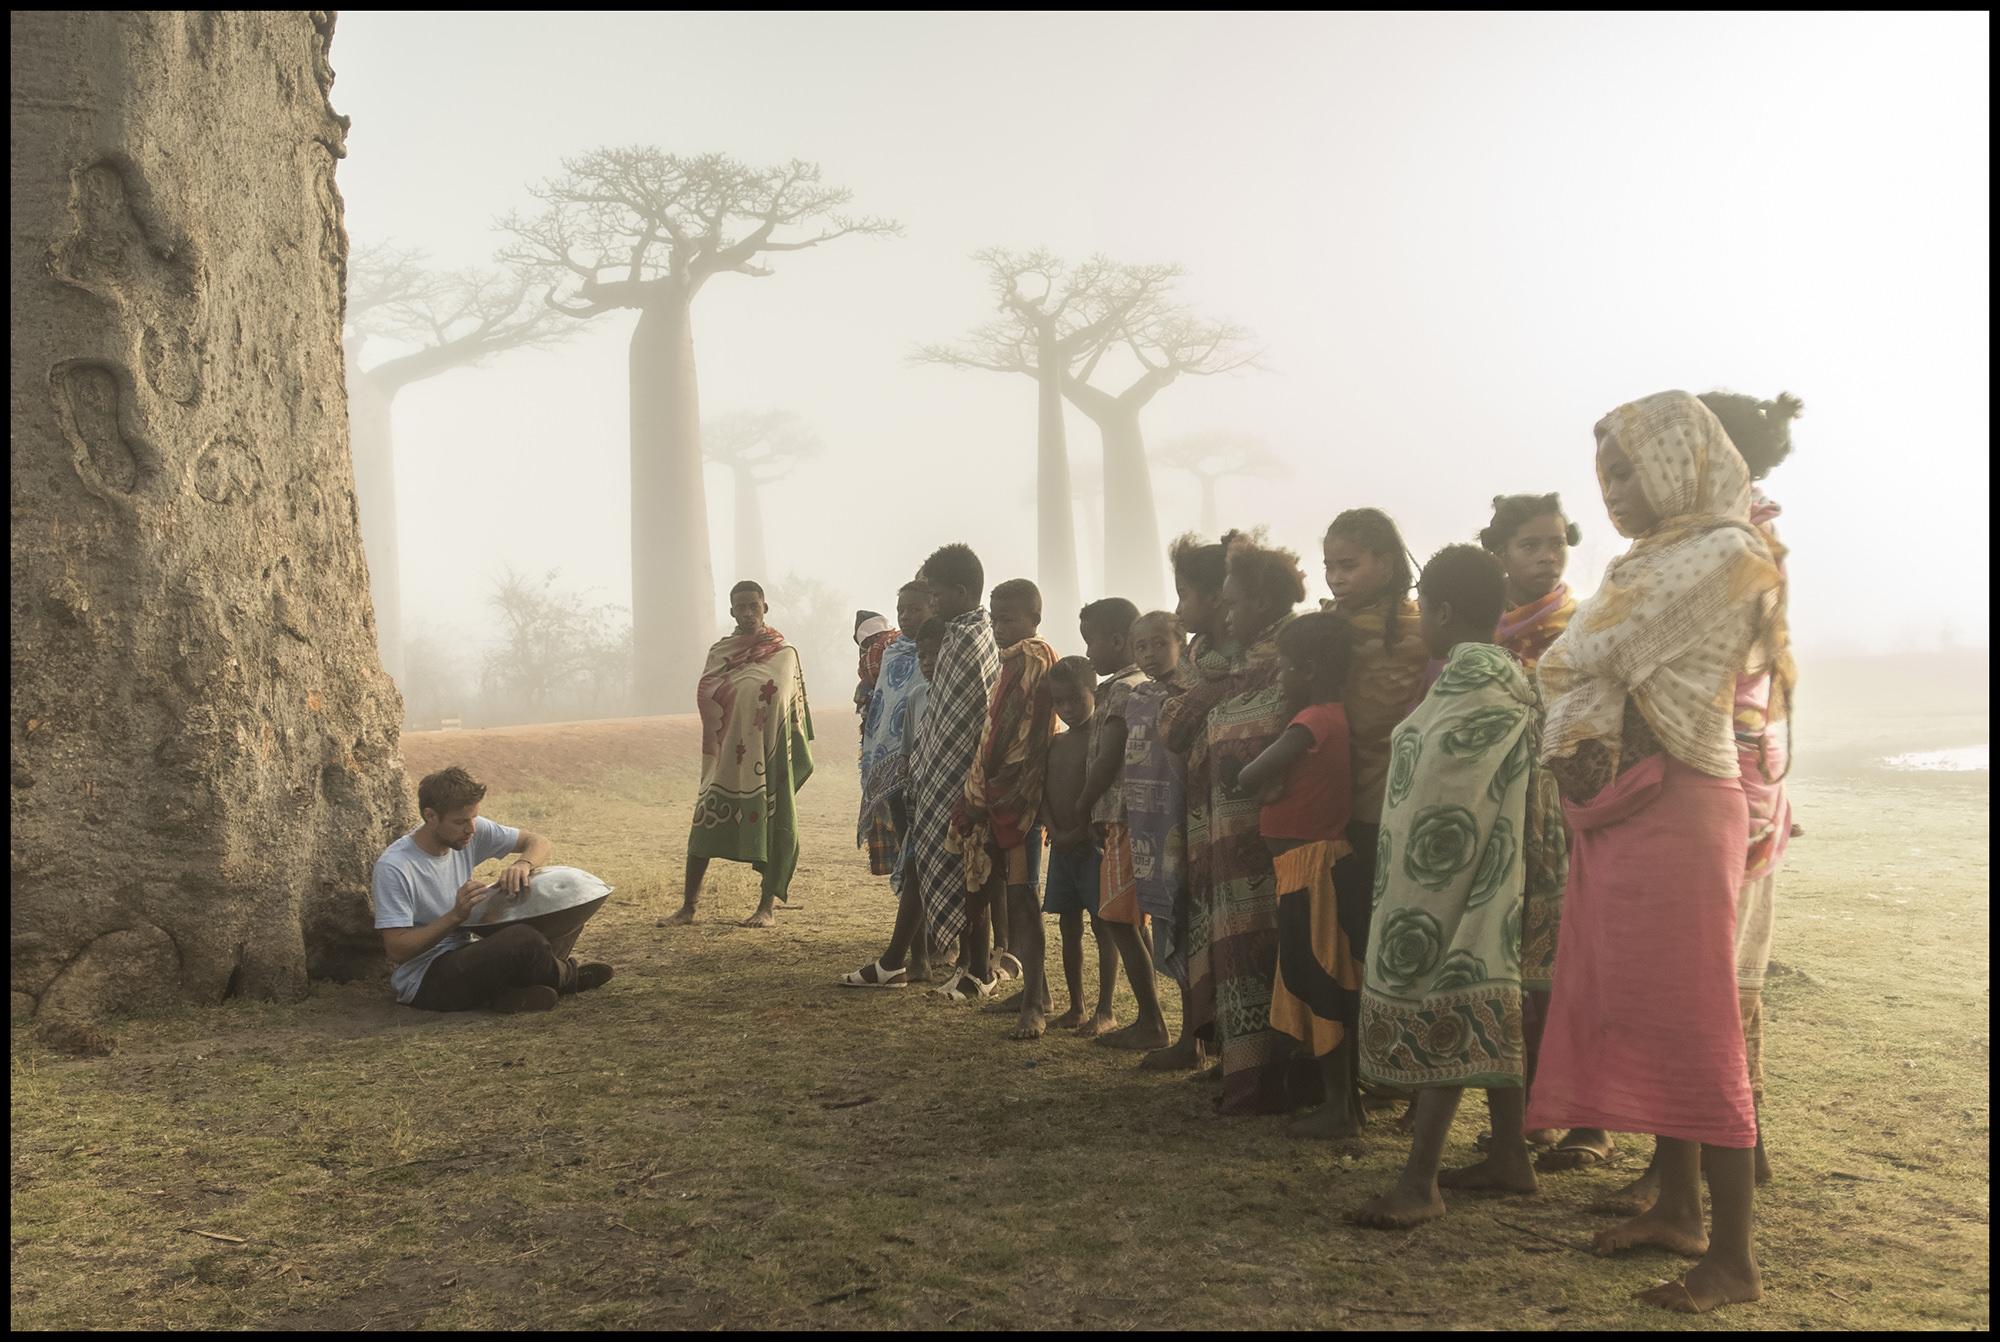 Digital Patrik Wallner Baobab Wilko Playing LOWQ 2000P